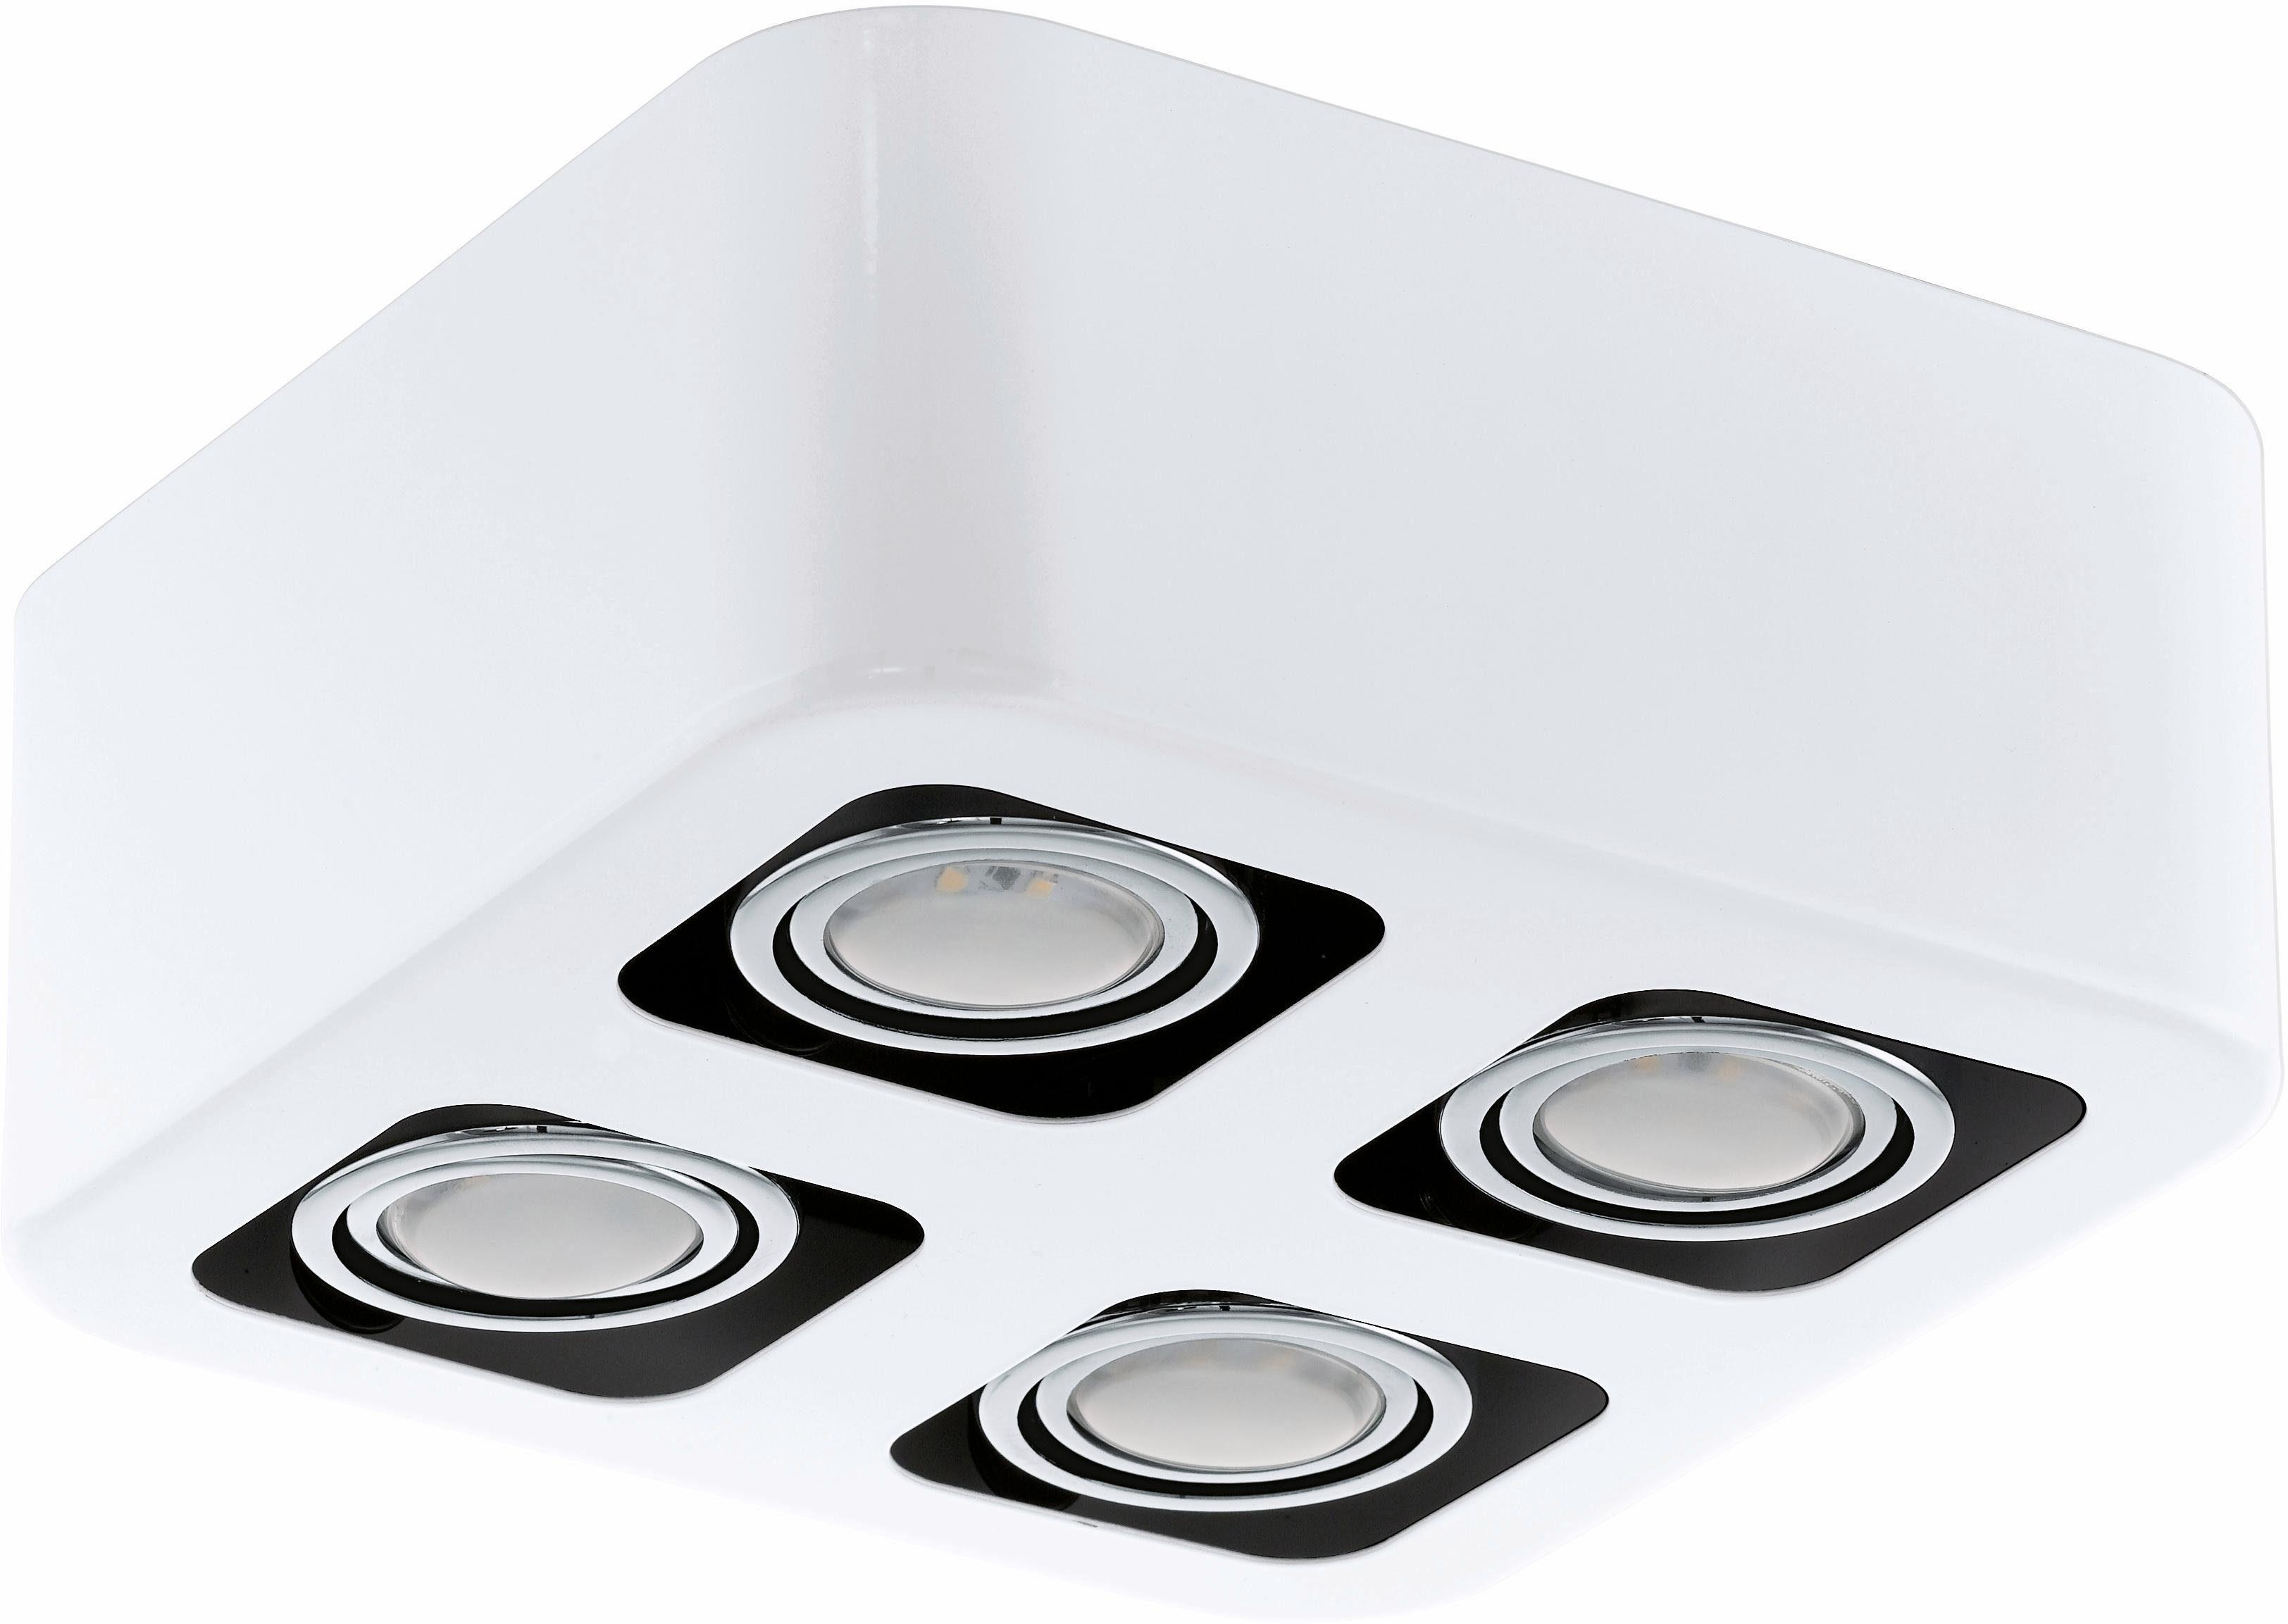 EGLO LED Aufbaustrahler »TORENO«, 4-flammig